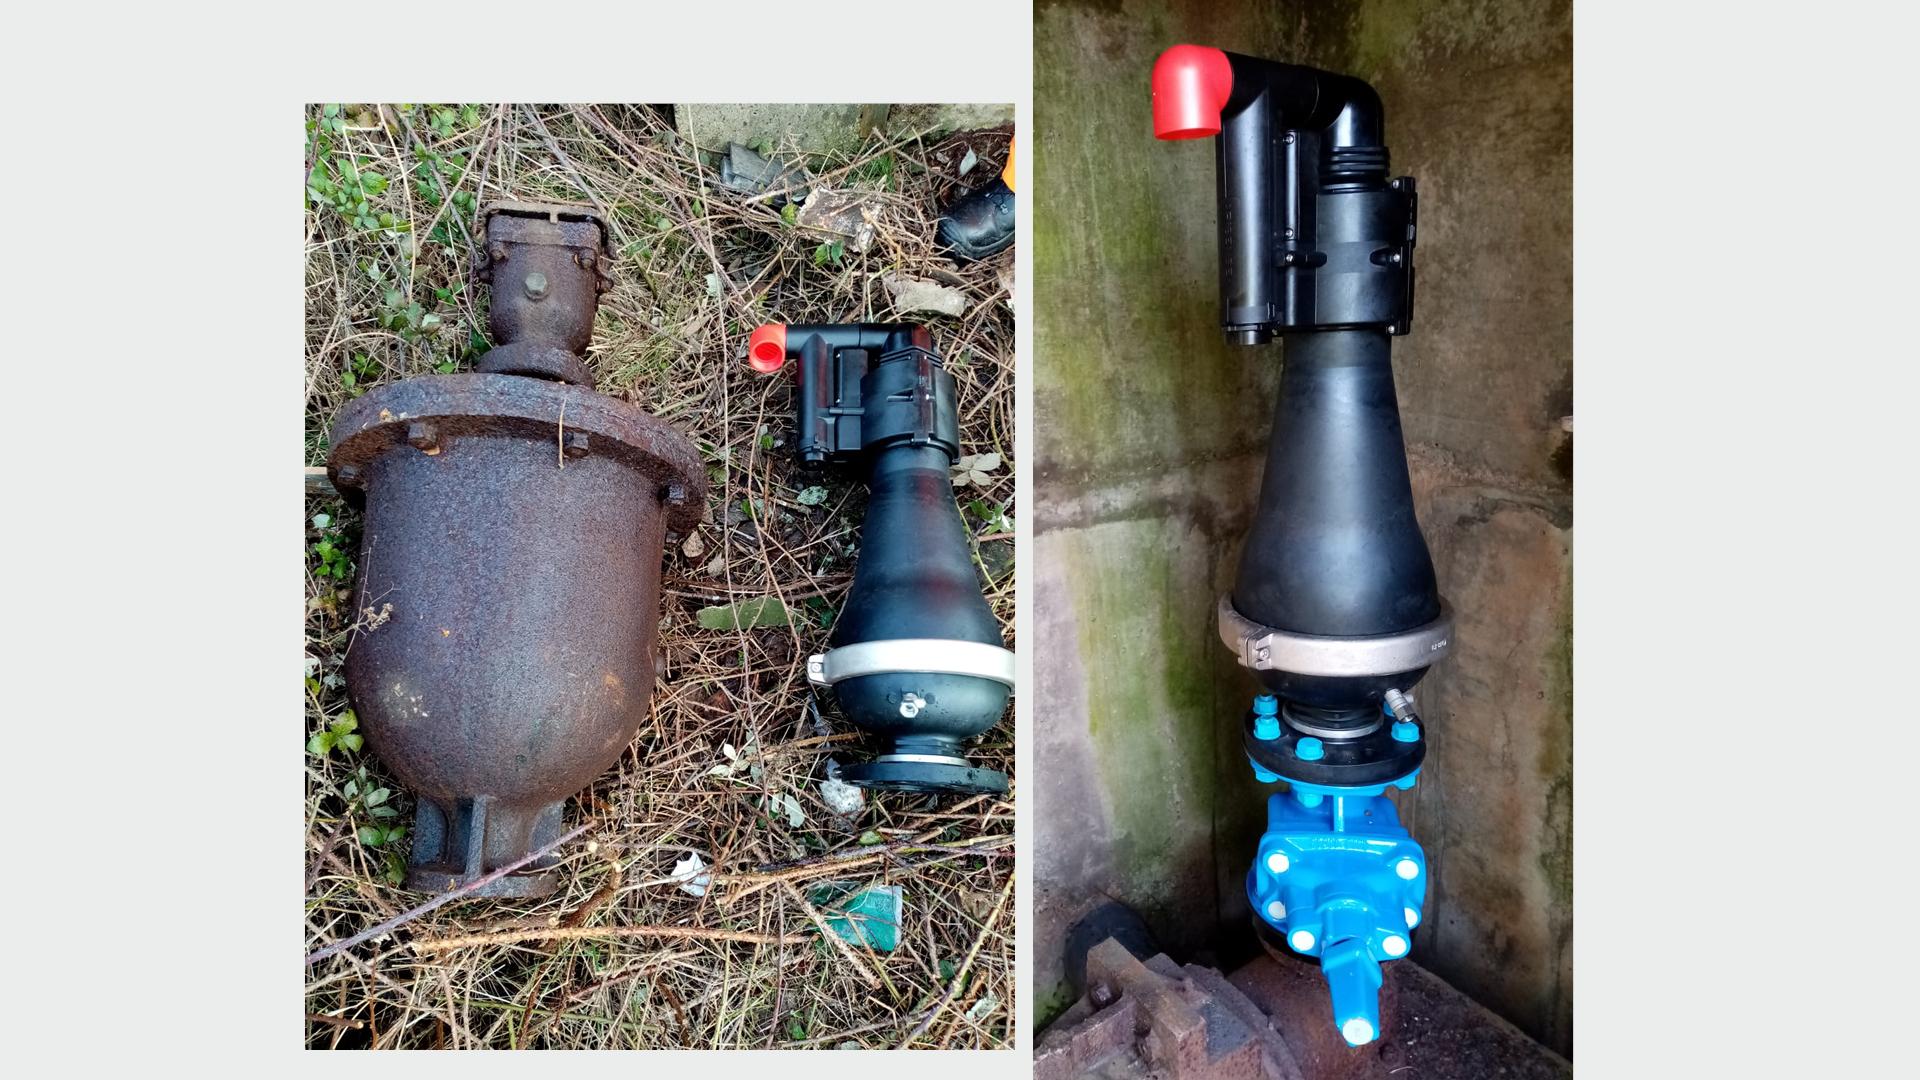 AVK Smart waste water case -Bottom left image